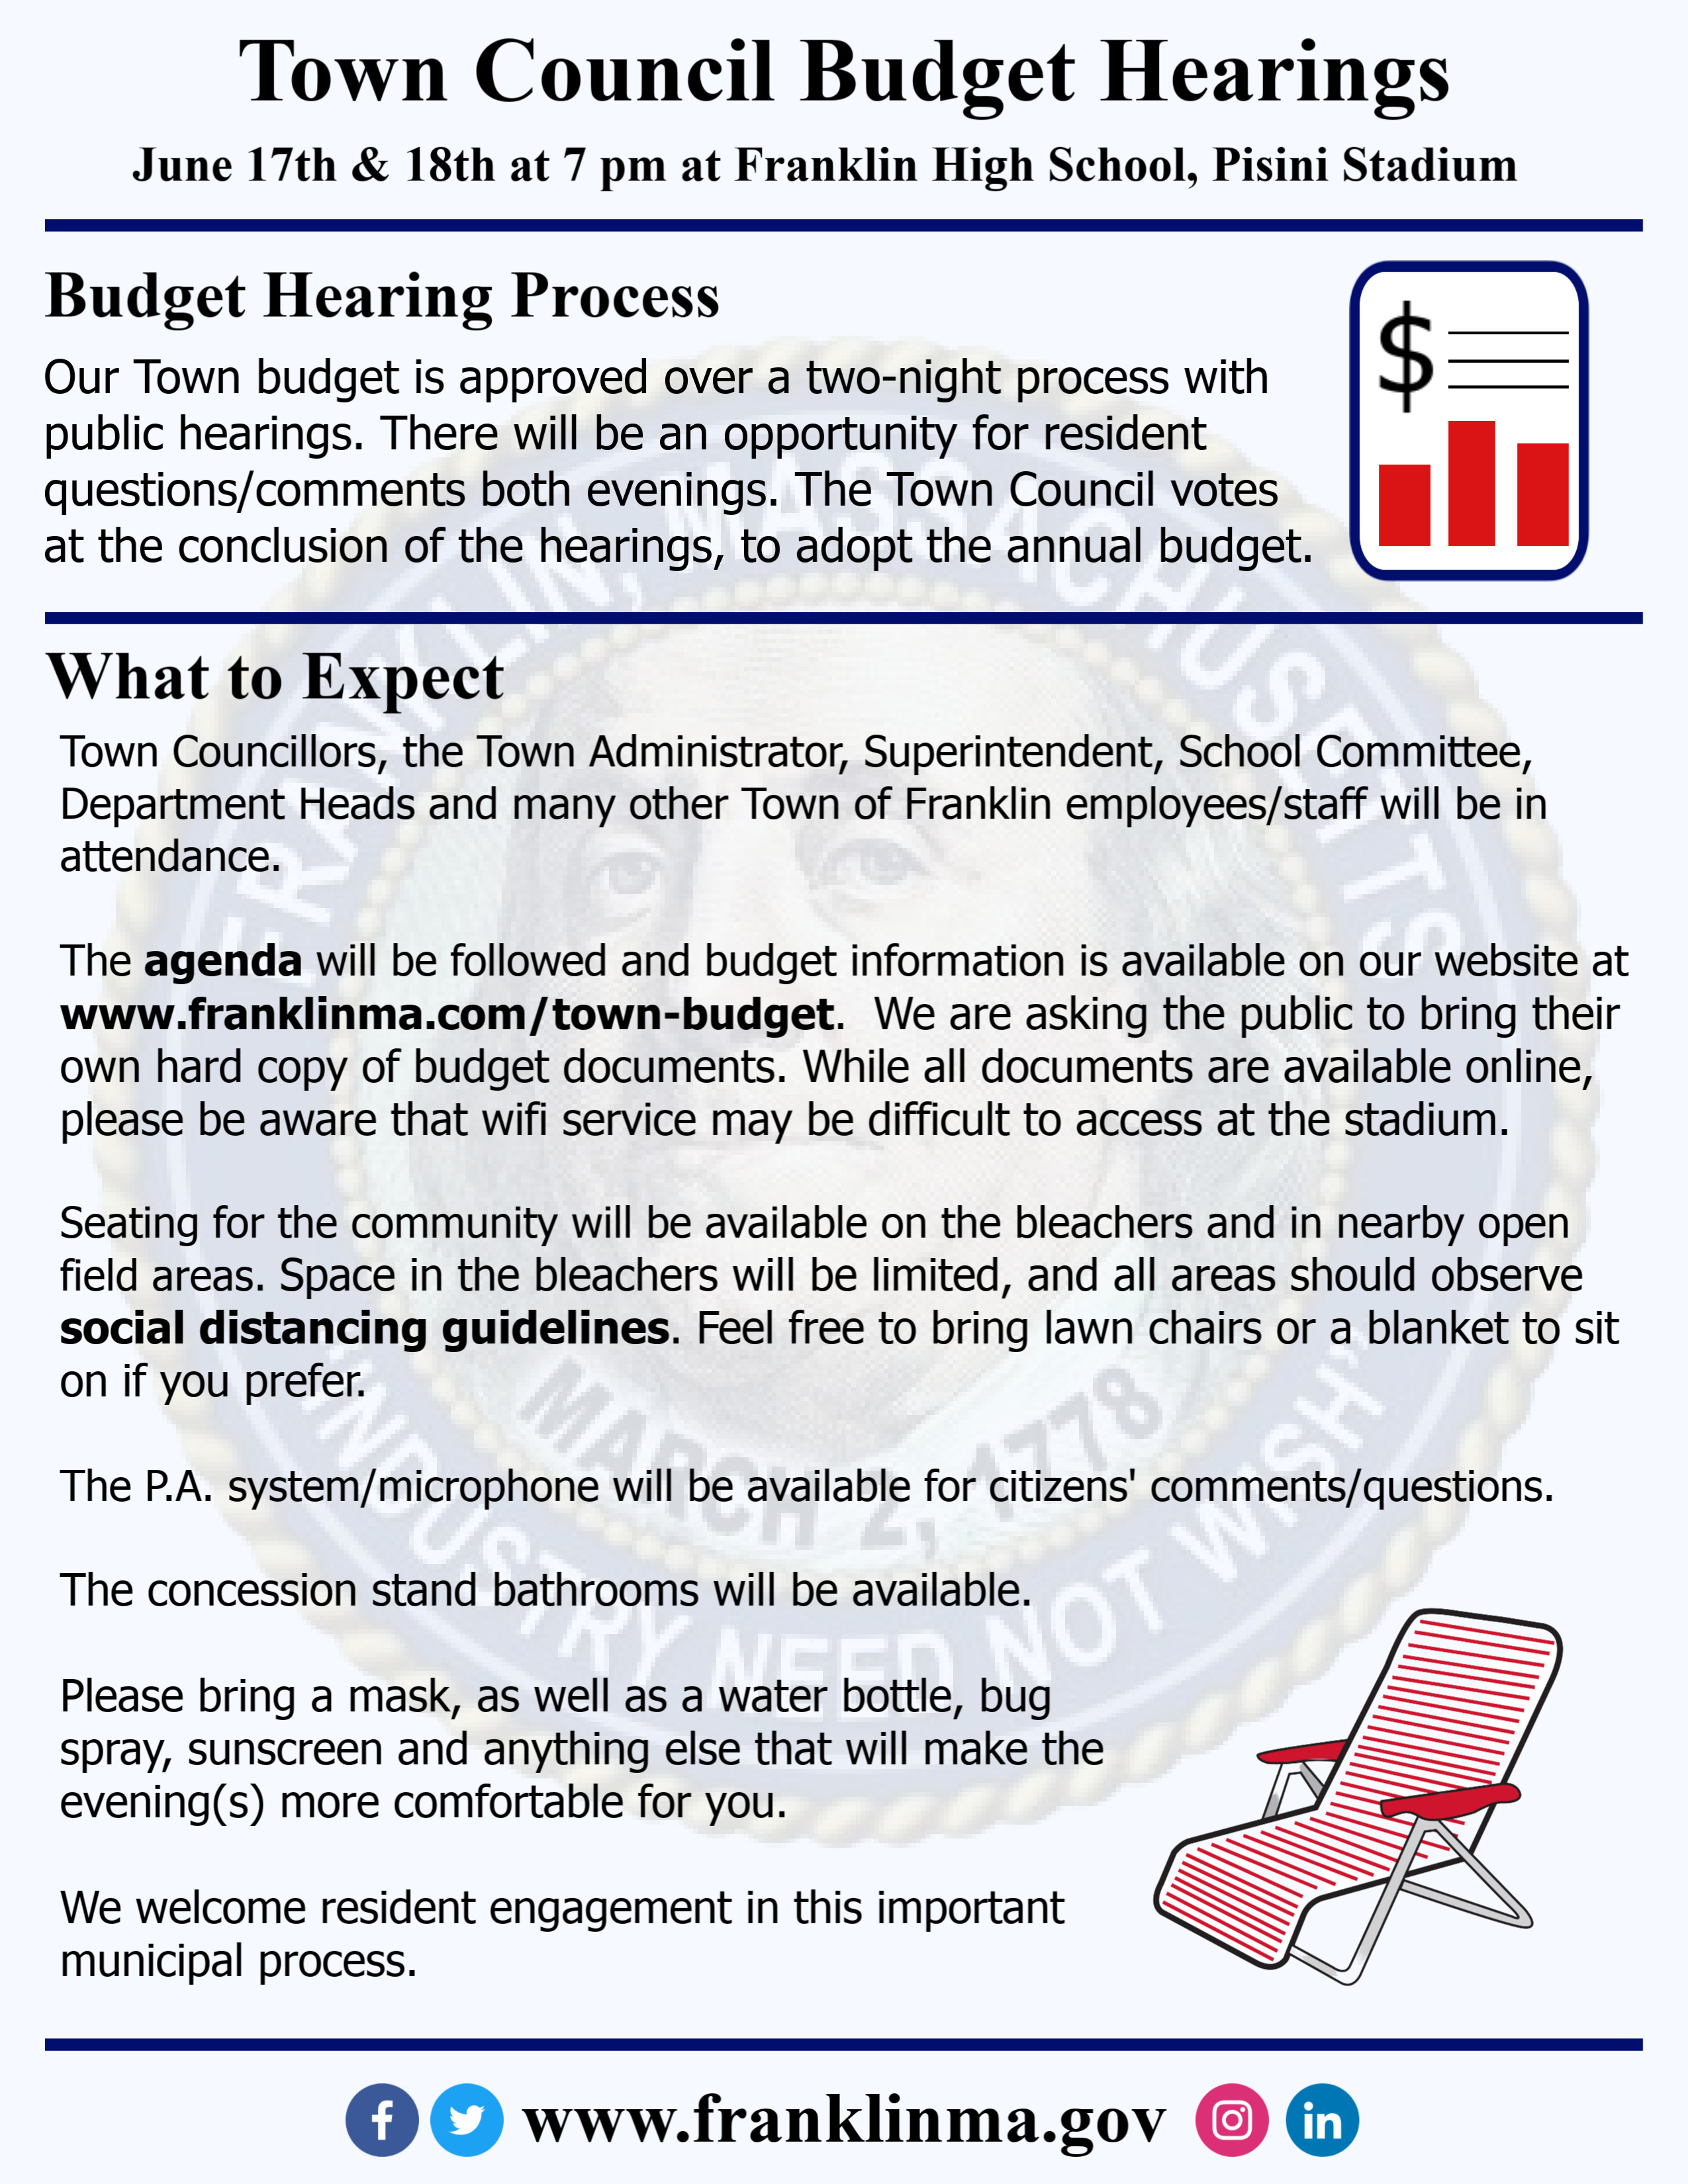 Town Council Budget Hearings - Jun 17-18